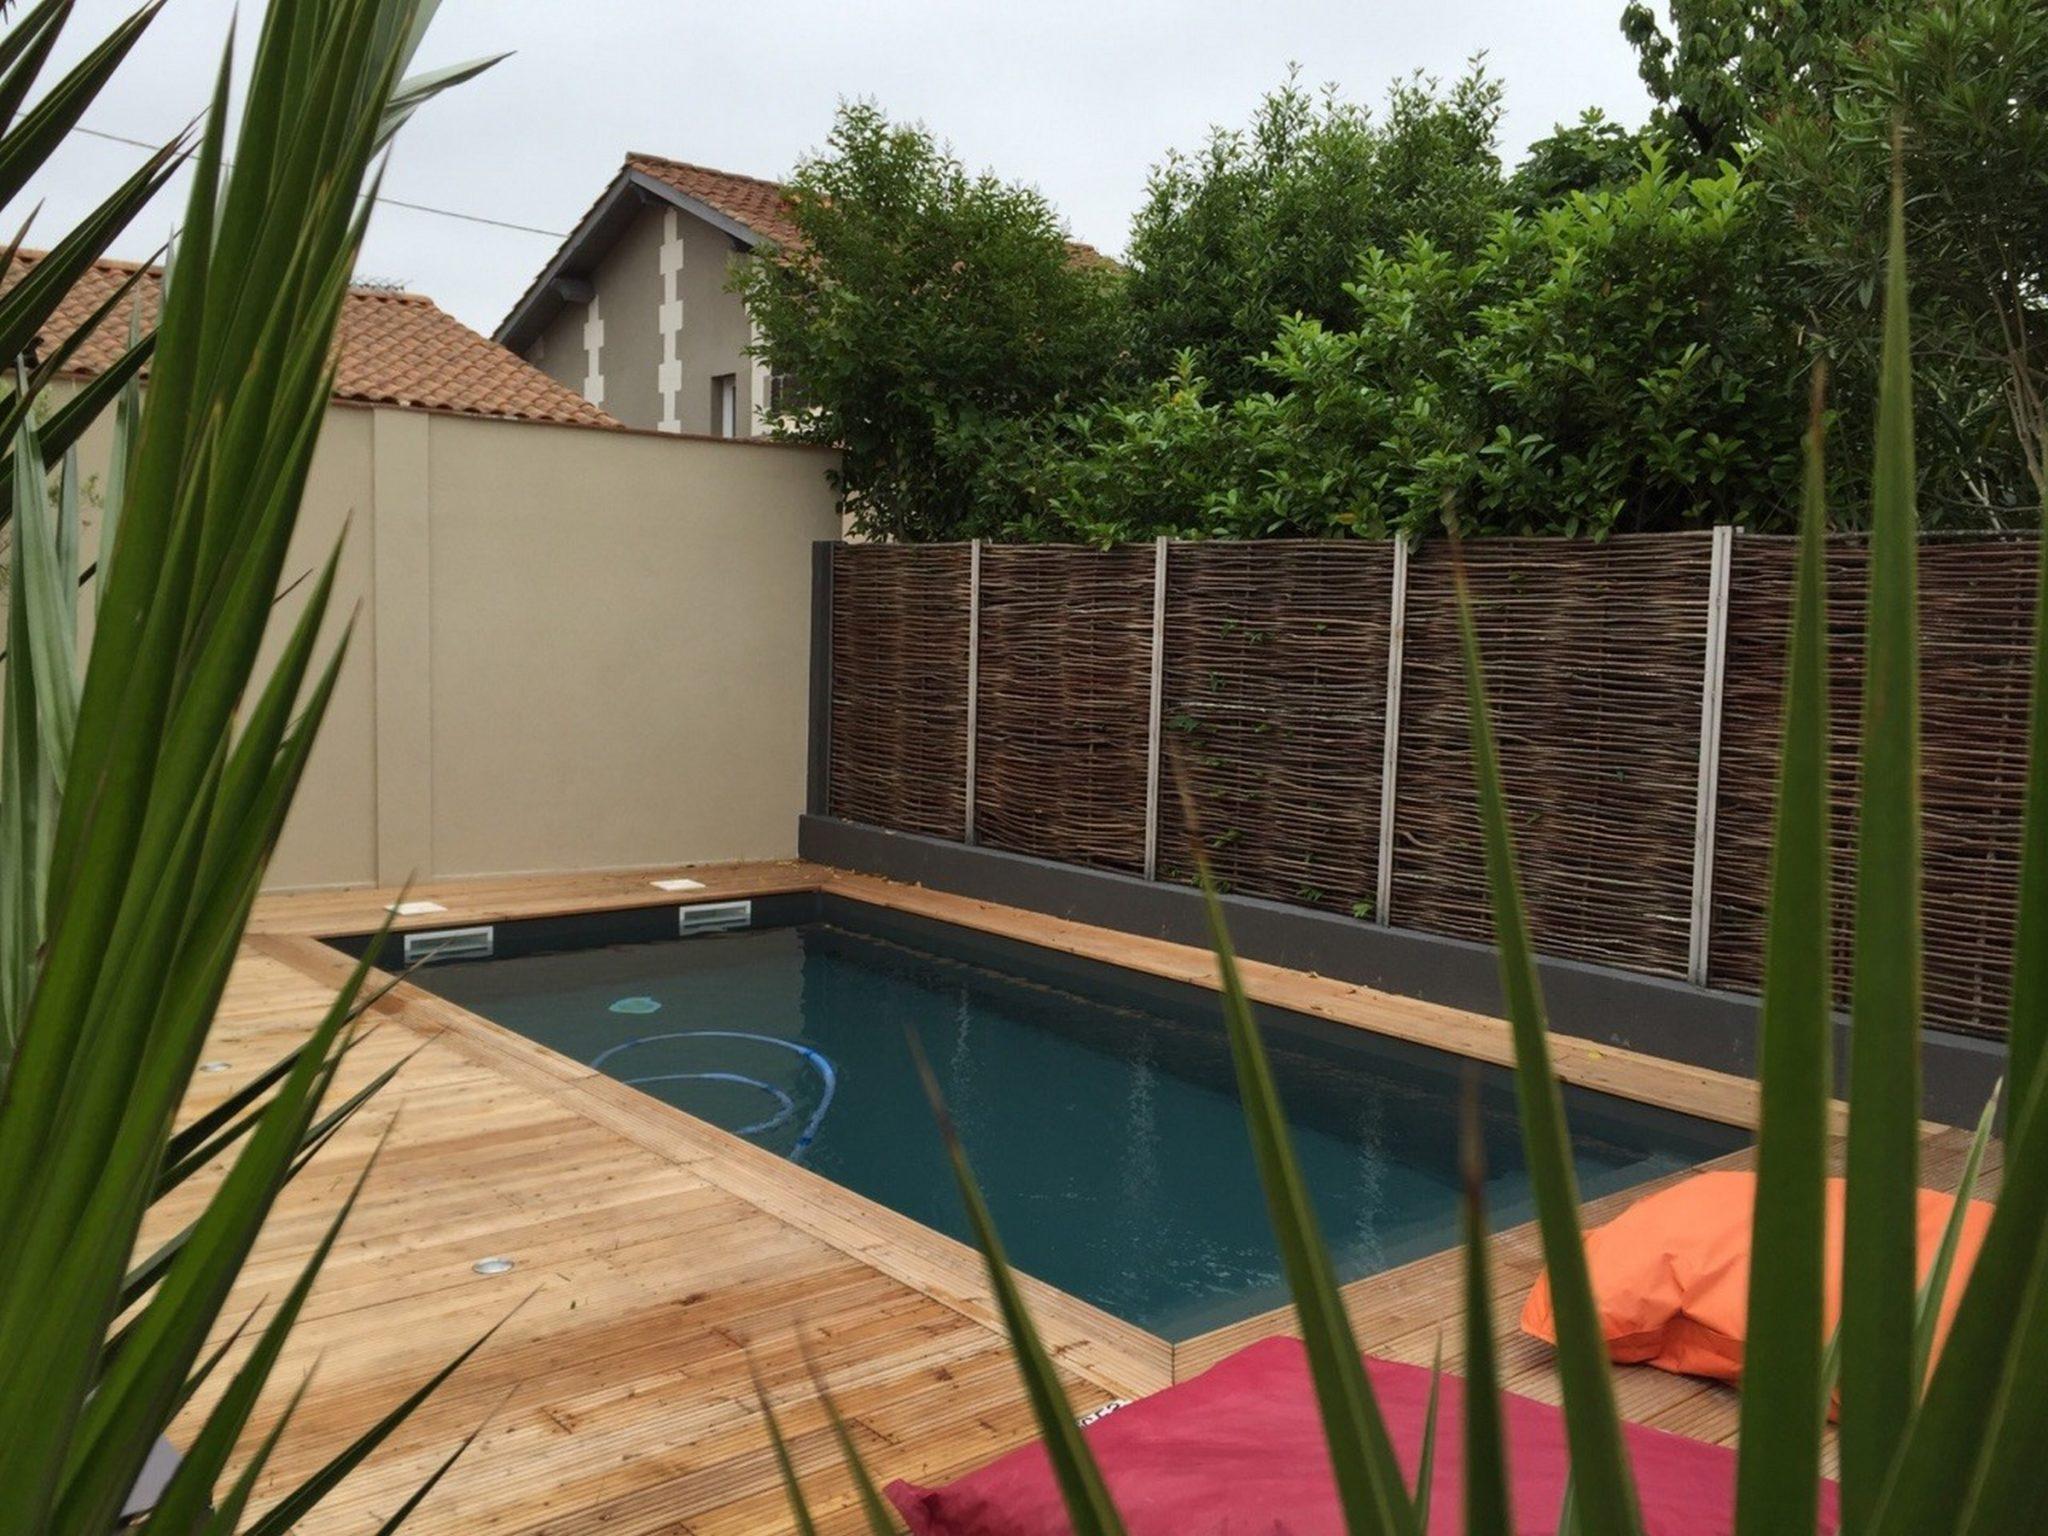 Piscine avec liner fonc reference piscine constructeur Piscine avec liner